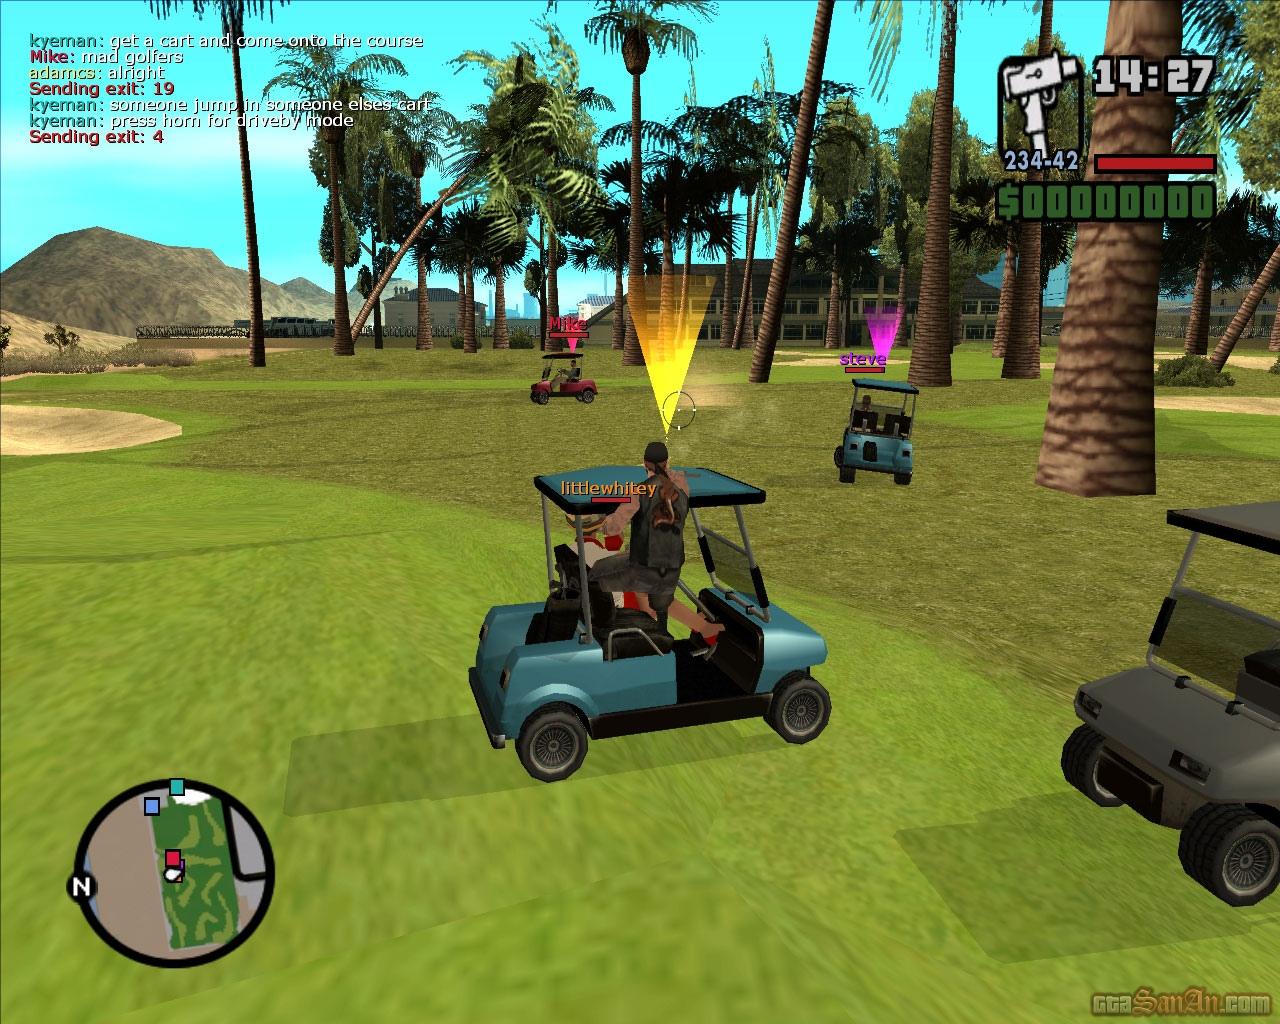 grand theft auto san andreas + multiplayer 0.3e скачать через торрент